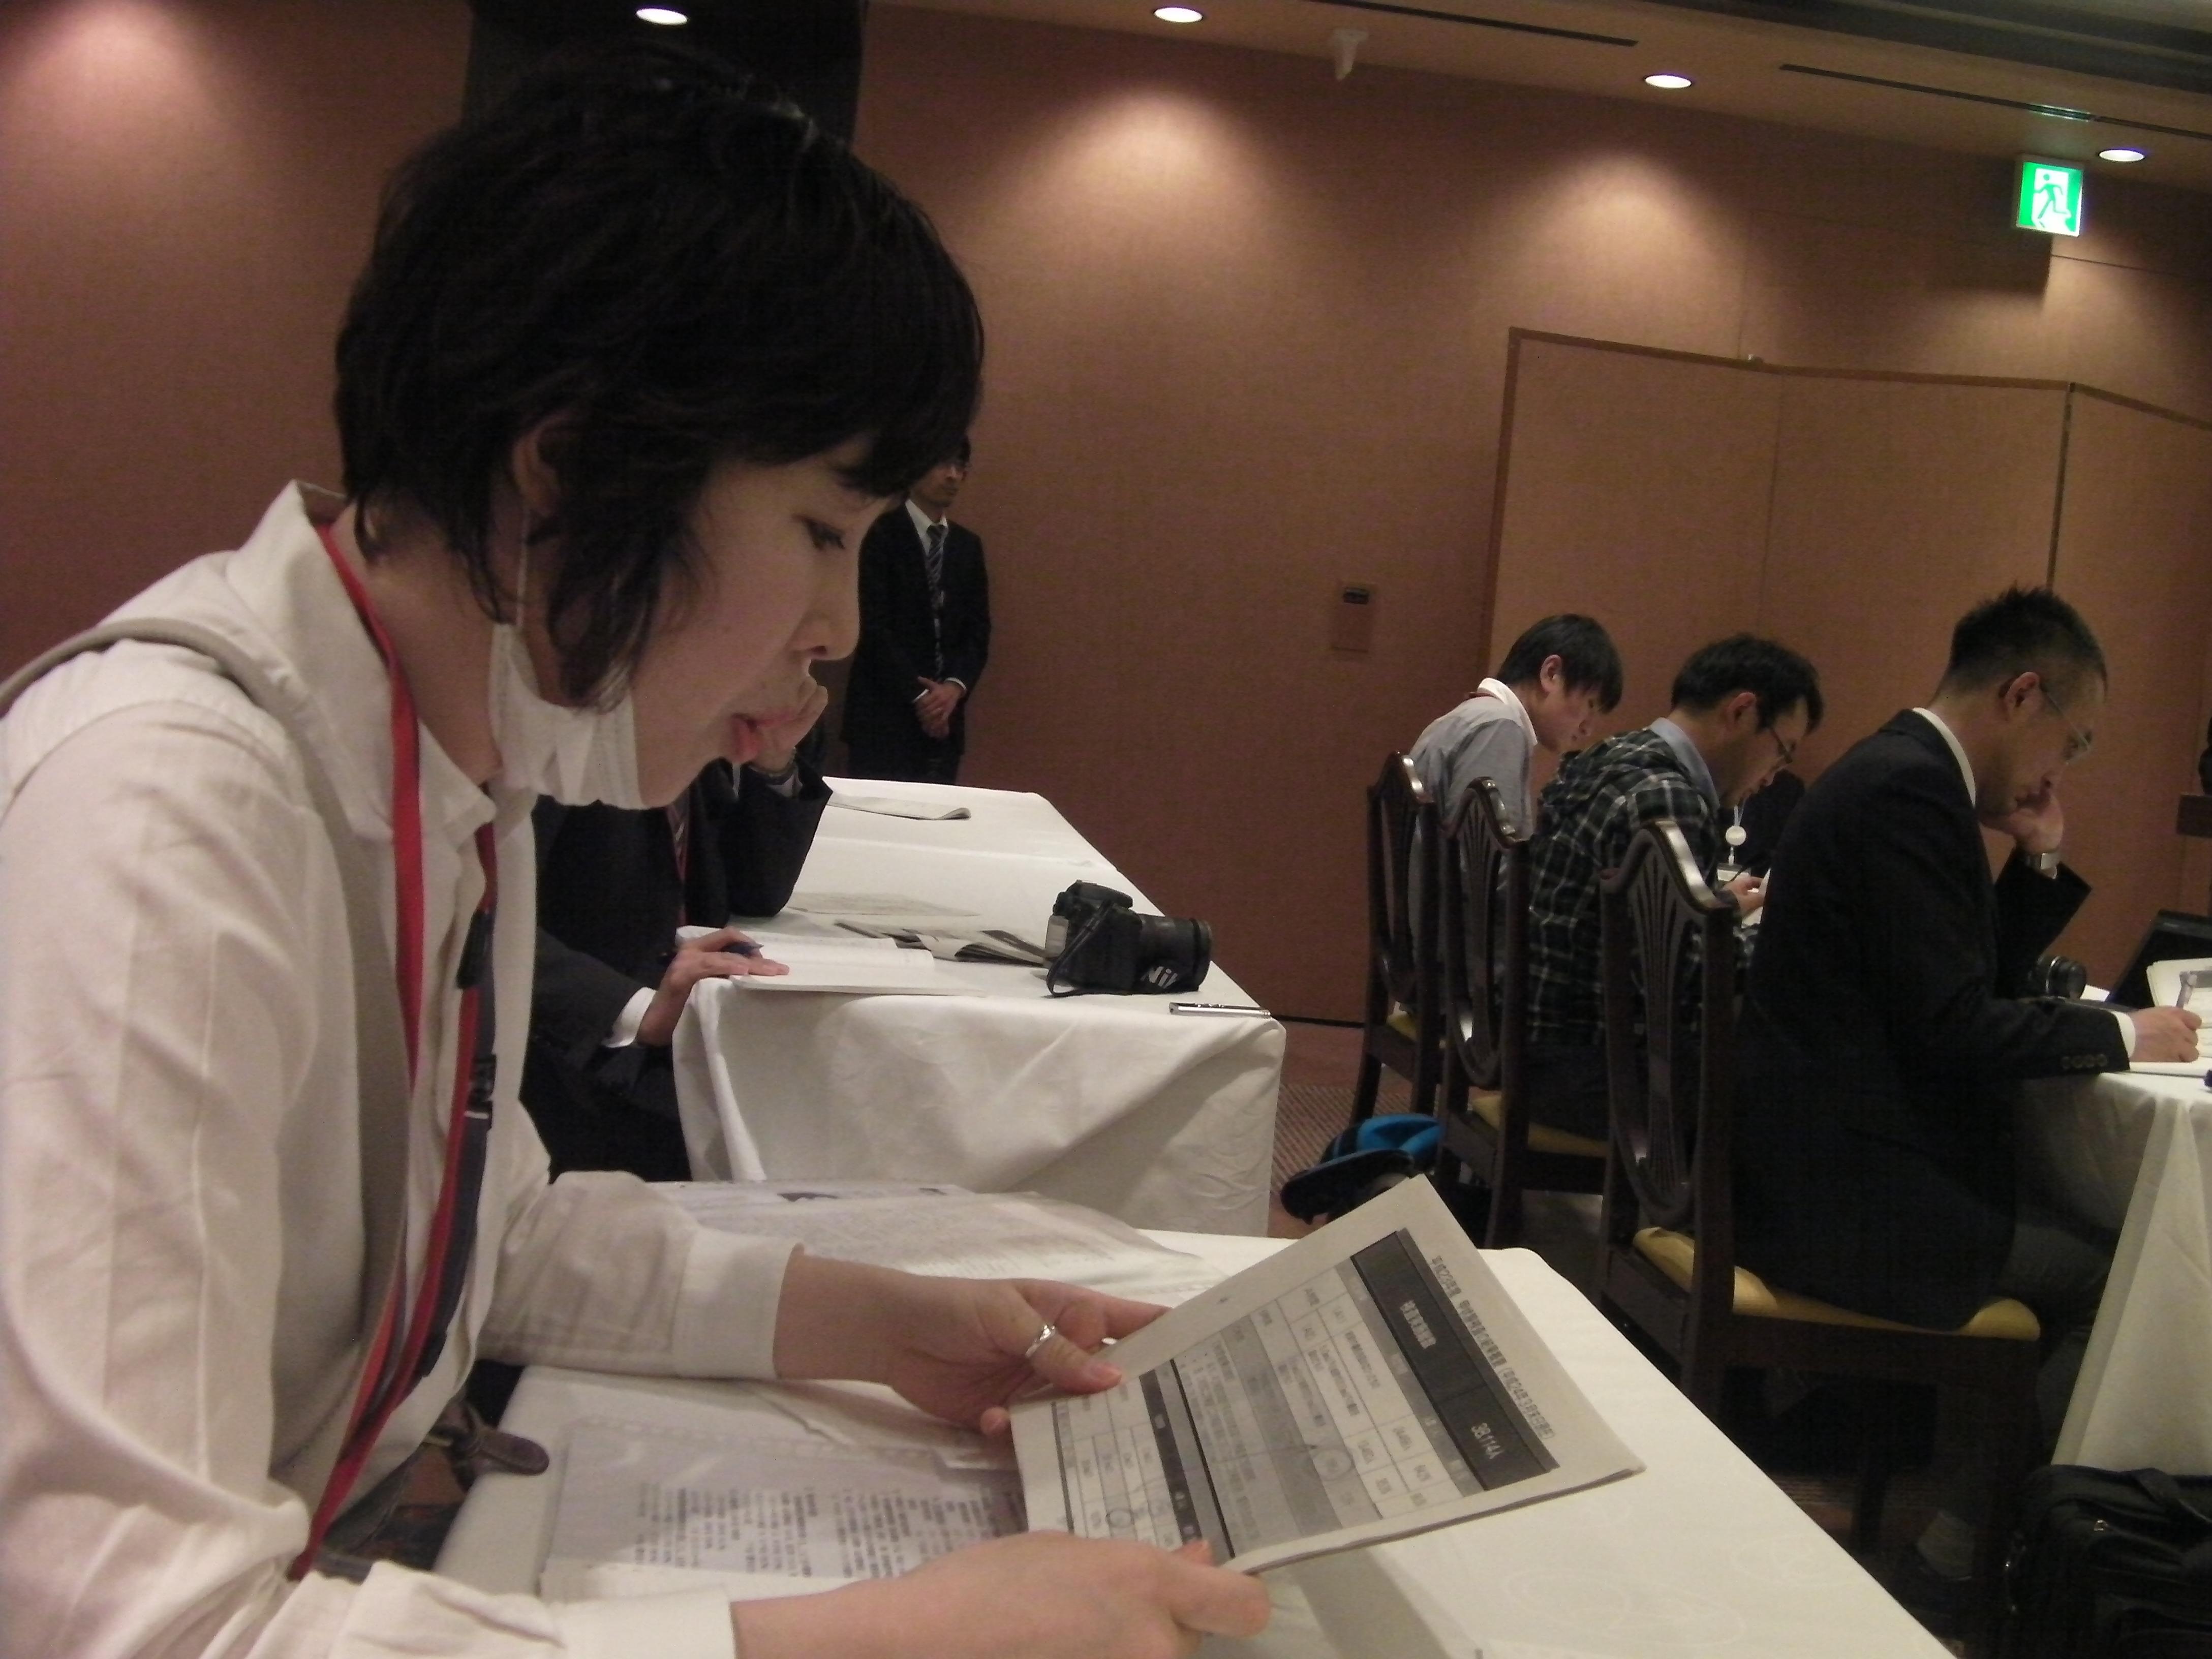 http://daily.magazine9.jp/m9/oshidori/SANY0267.JPG